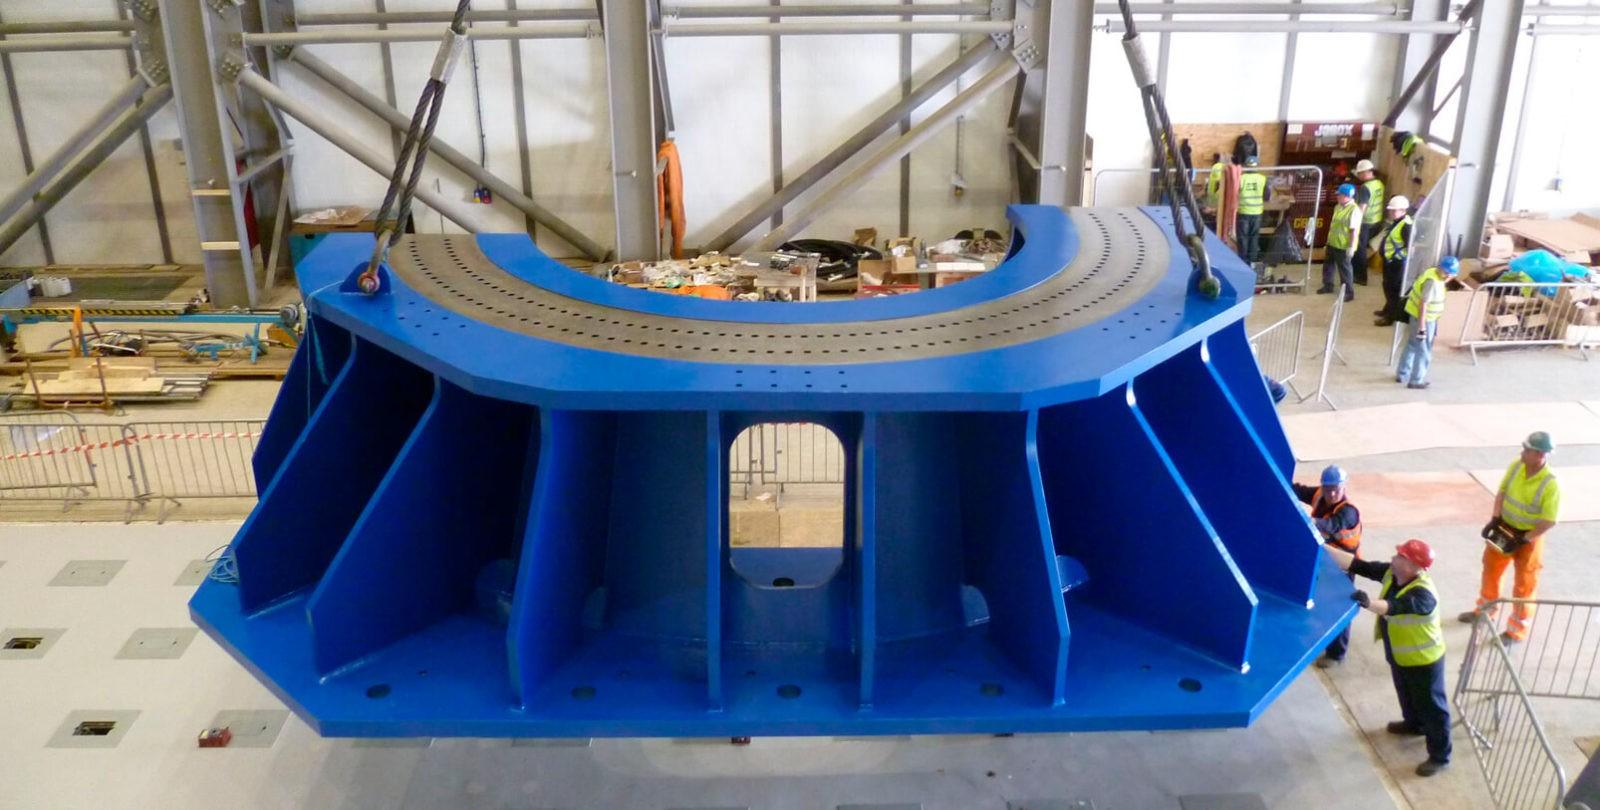 NAREC_FUJIN_Wind_Turbine_Drive_Train_Test_Facility_UK_ADA_Idom_2_